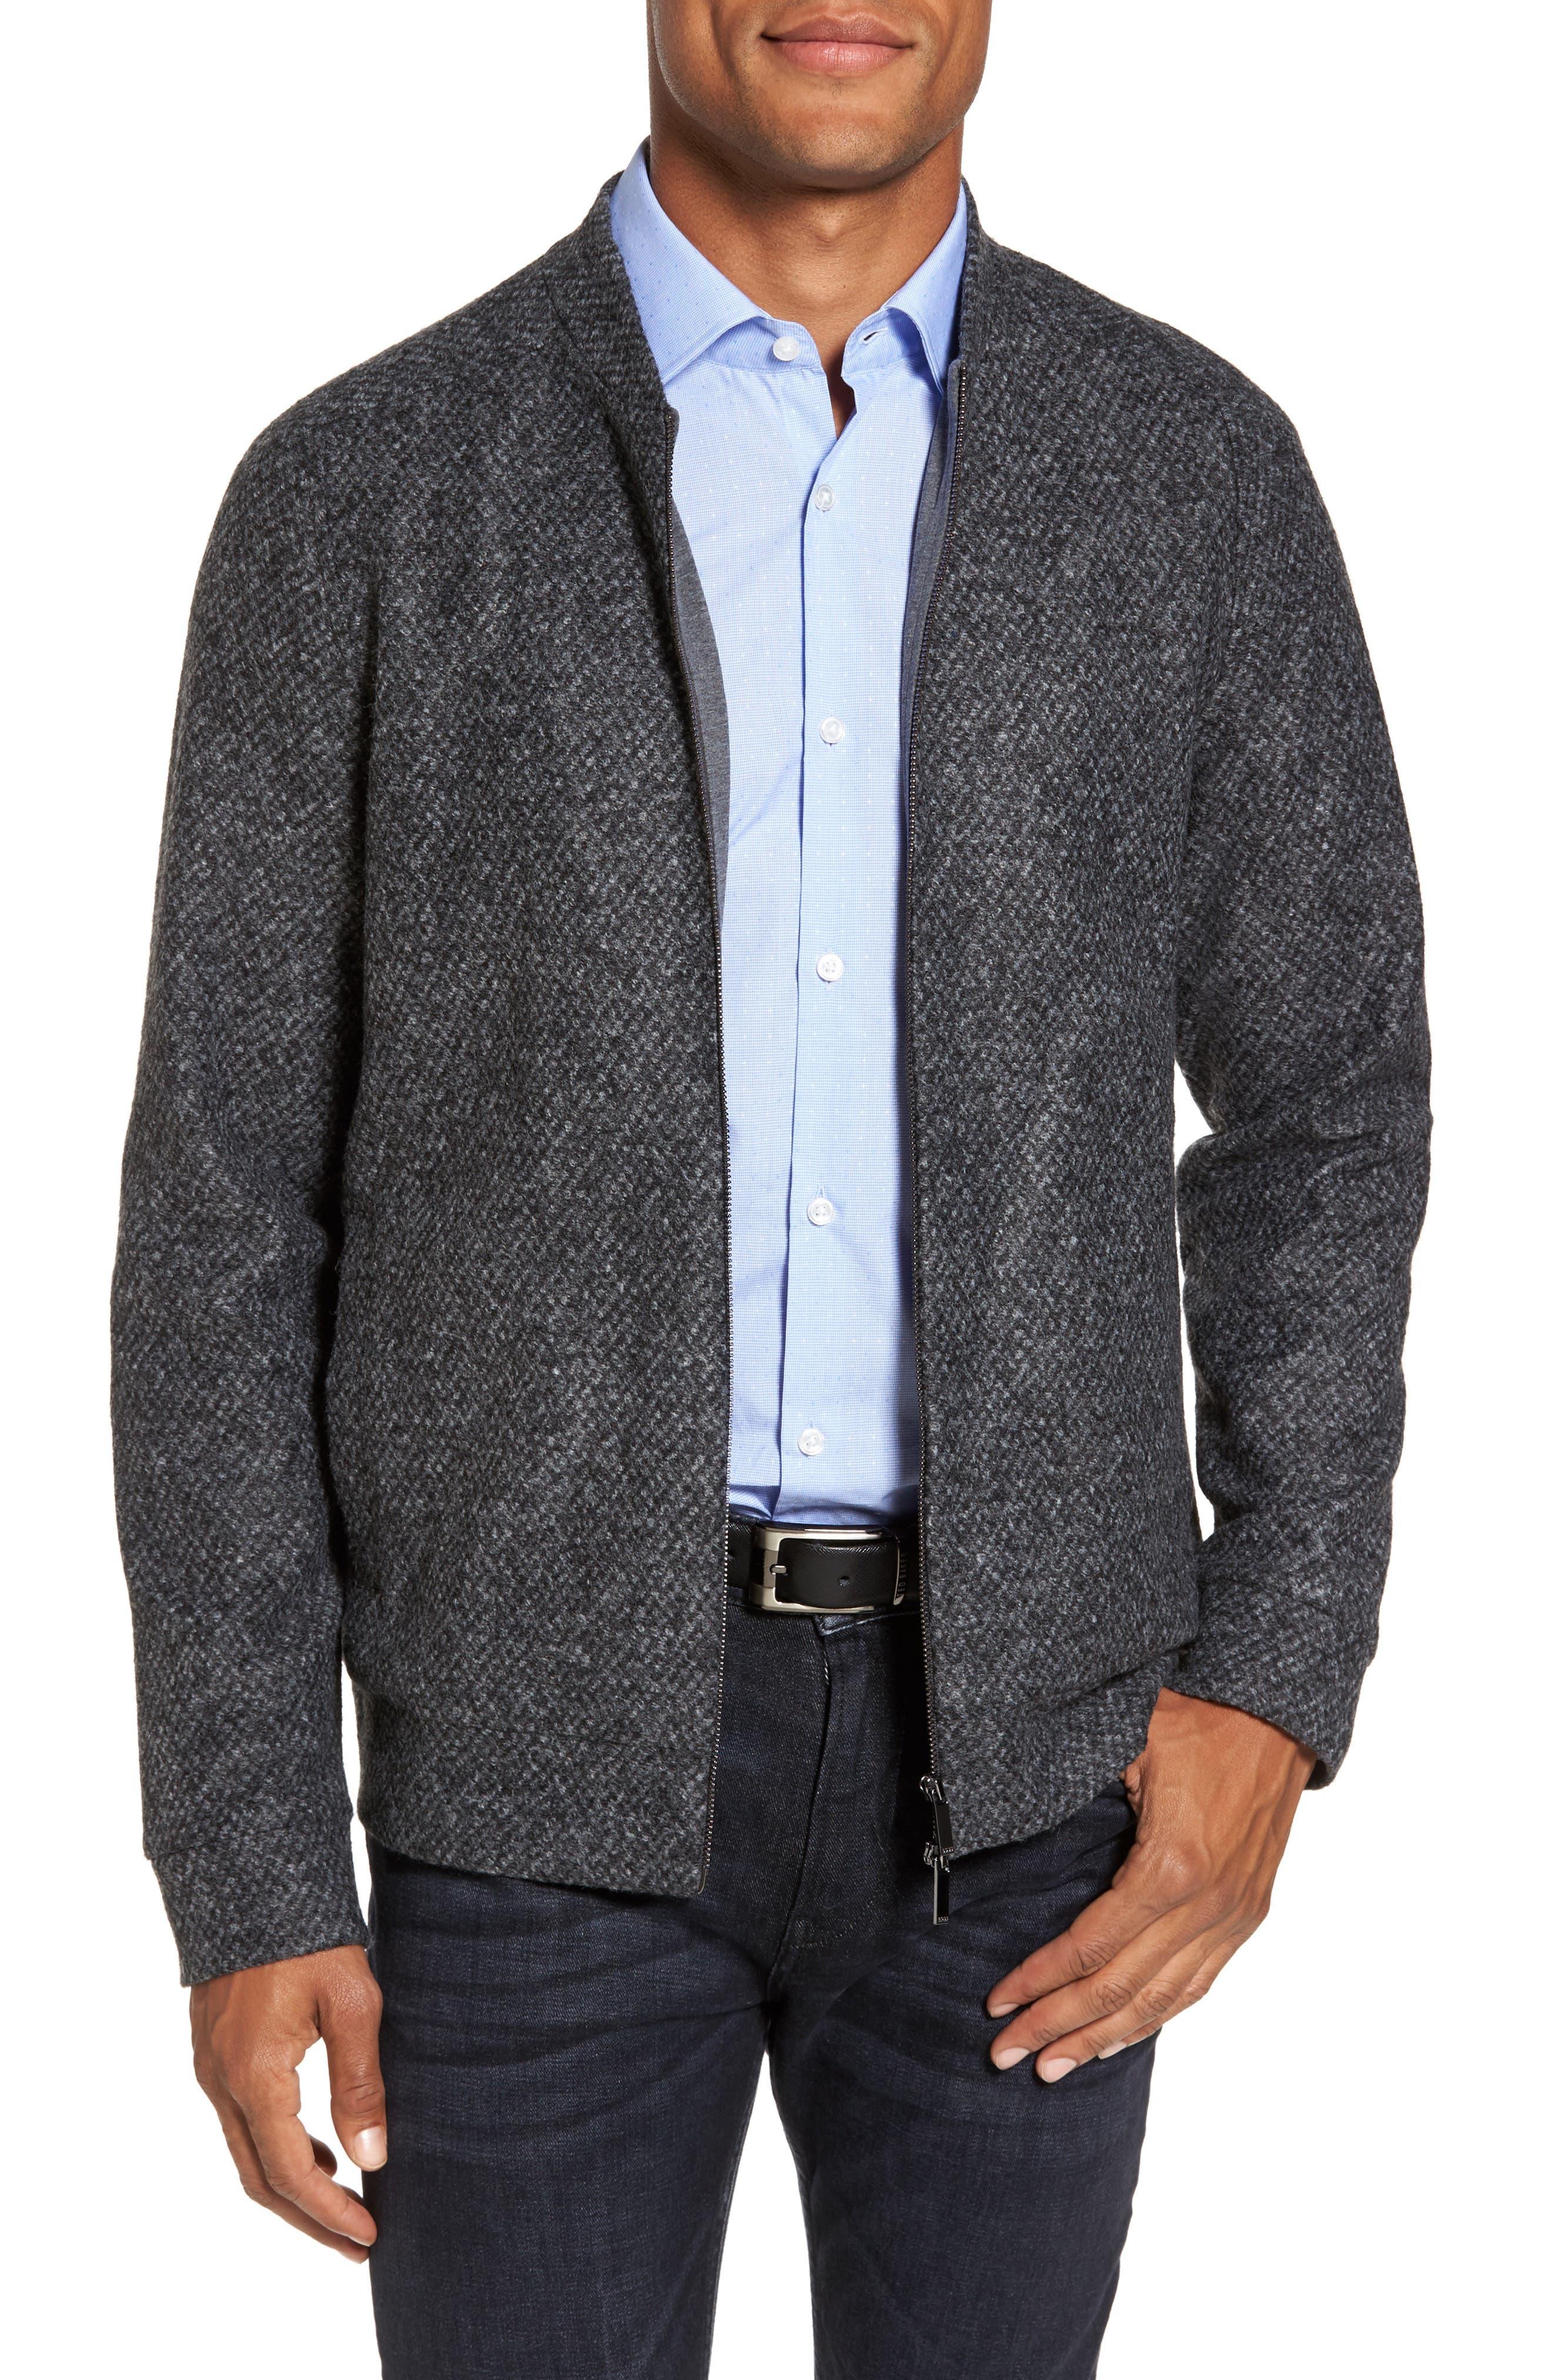 Salea Slim Fit Bomber Jacket,                             Main thumbnail 1, color,                             Grey